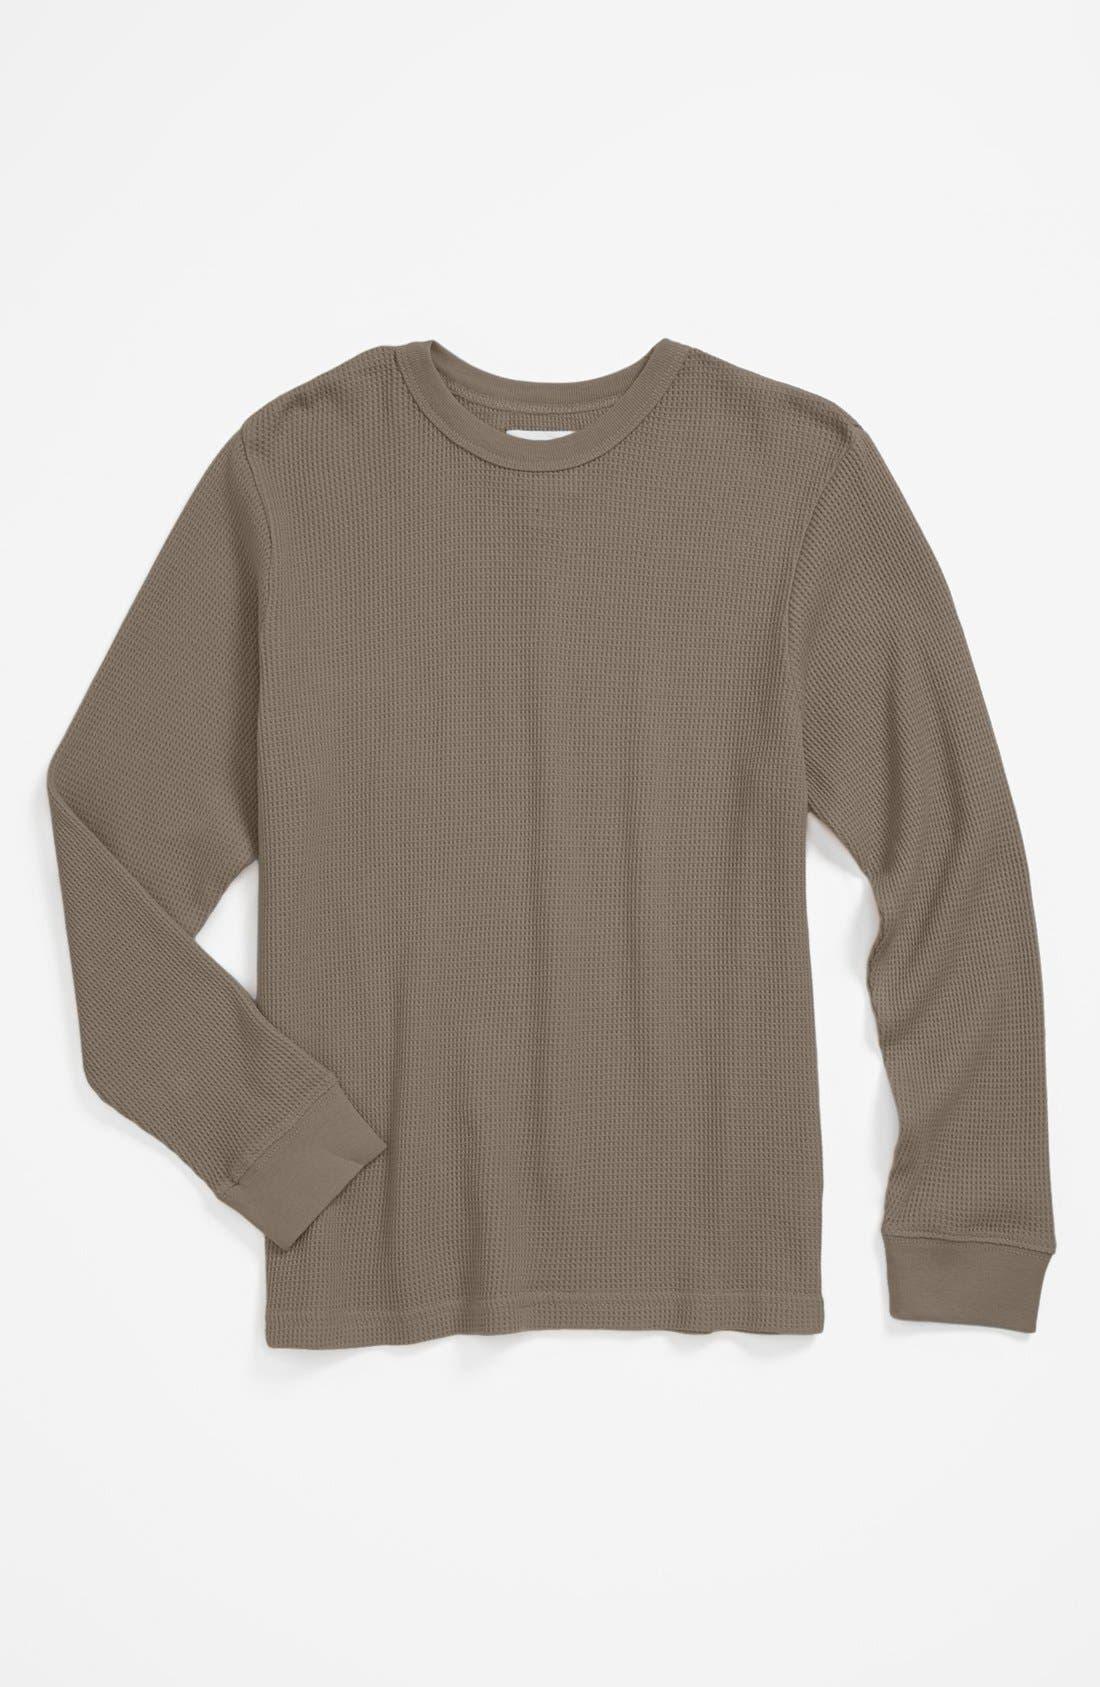 Alternate Image 1 Selected - Peek Layering Thermal Shirt (Little Boys & Big Boys)